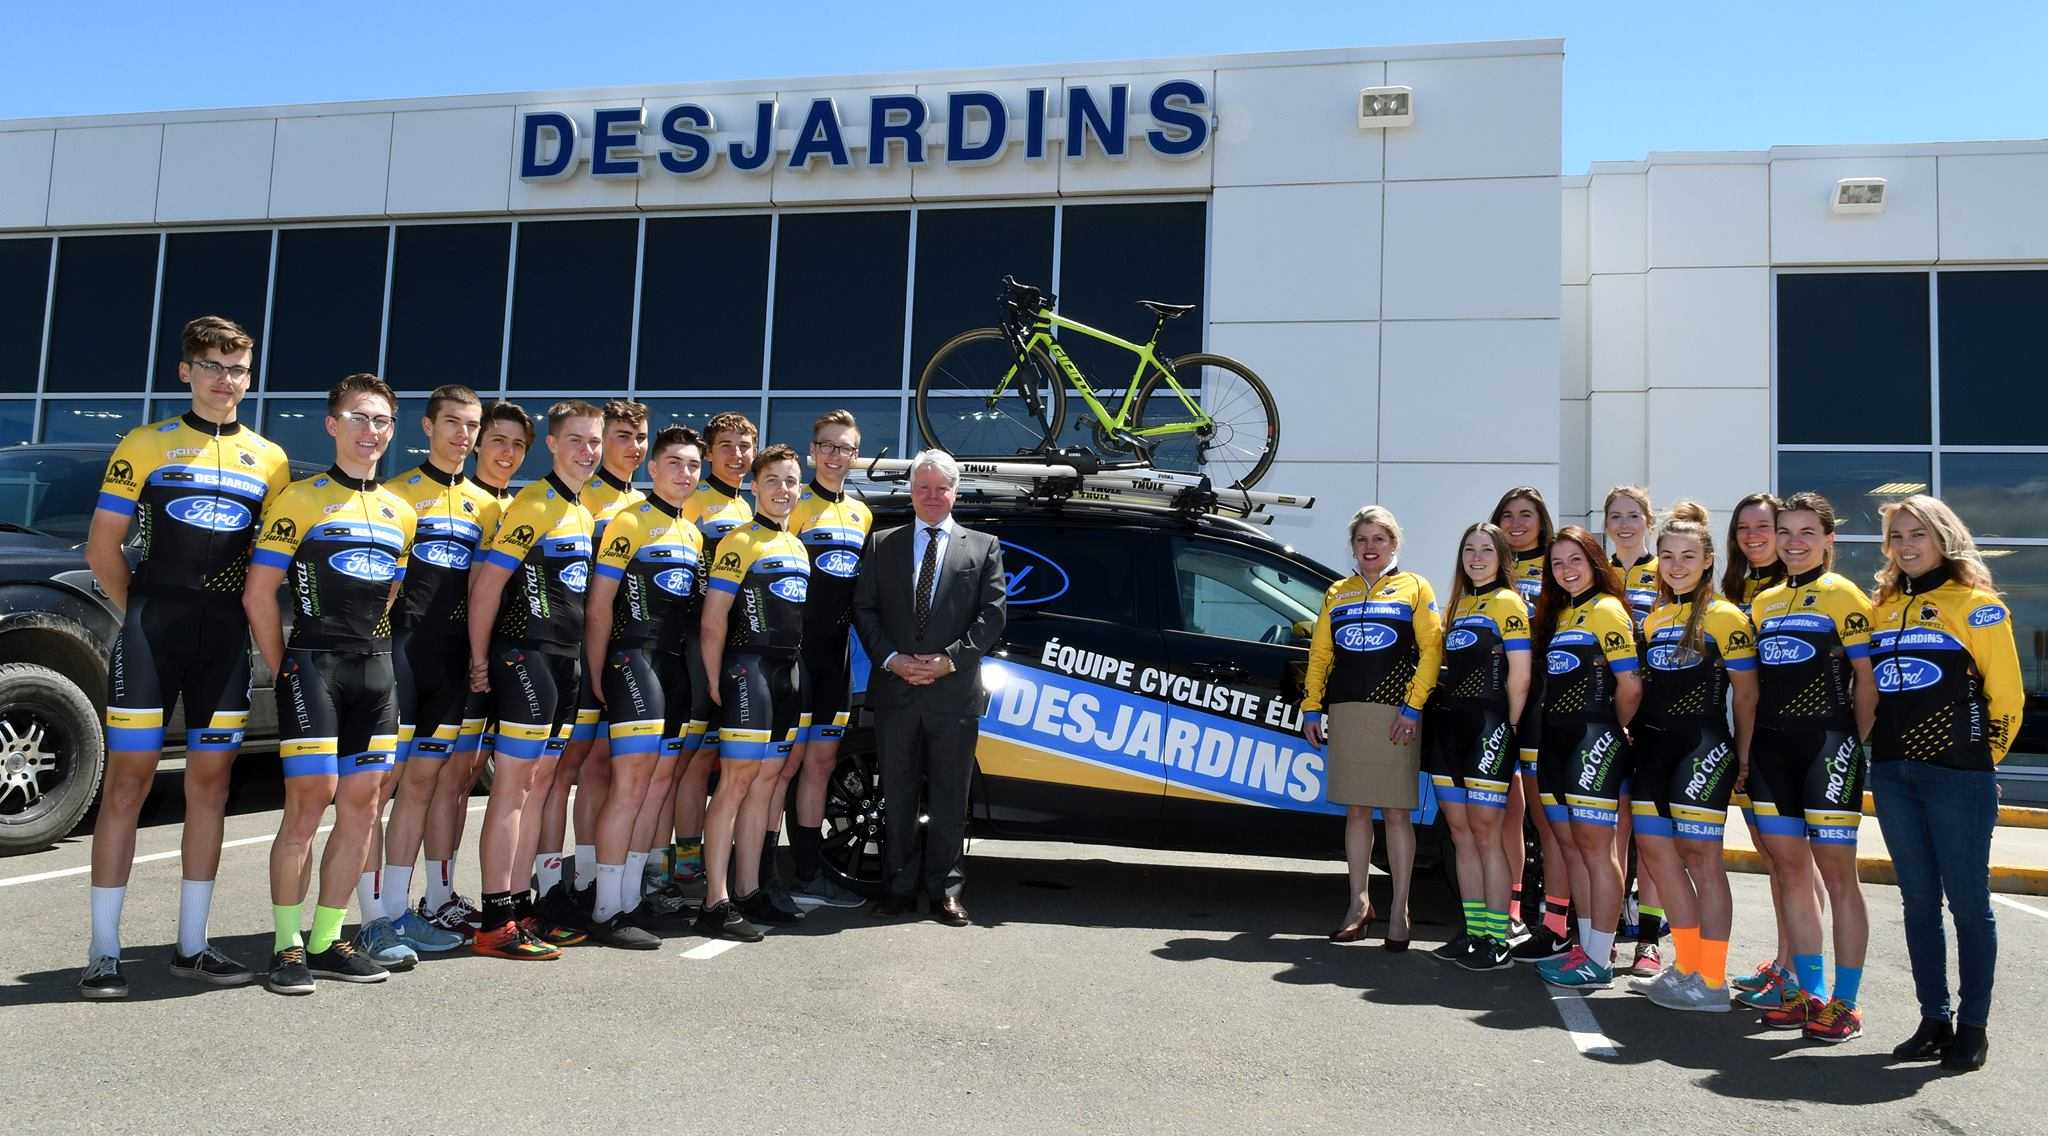 Equipe Cycliste Desjardins Ford